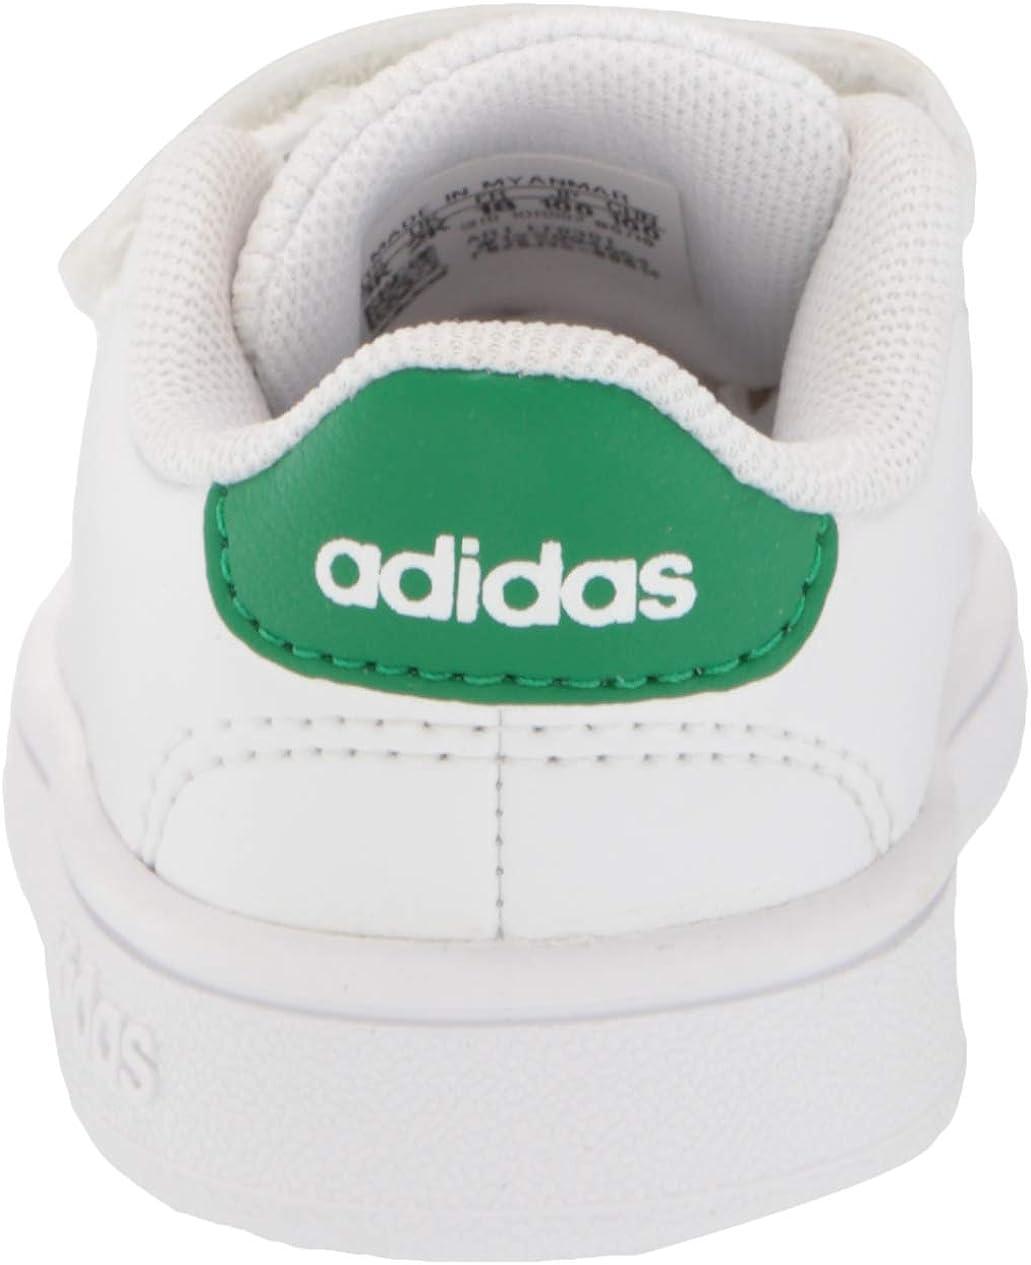 Adidas Advantage Tennisschuh für Kinder Weiß Grün Grau